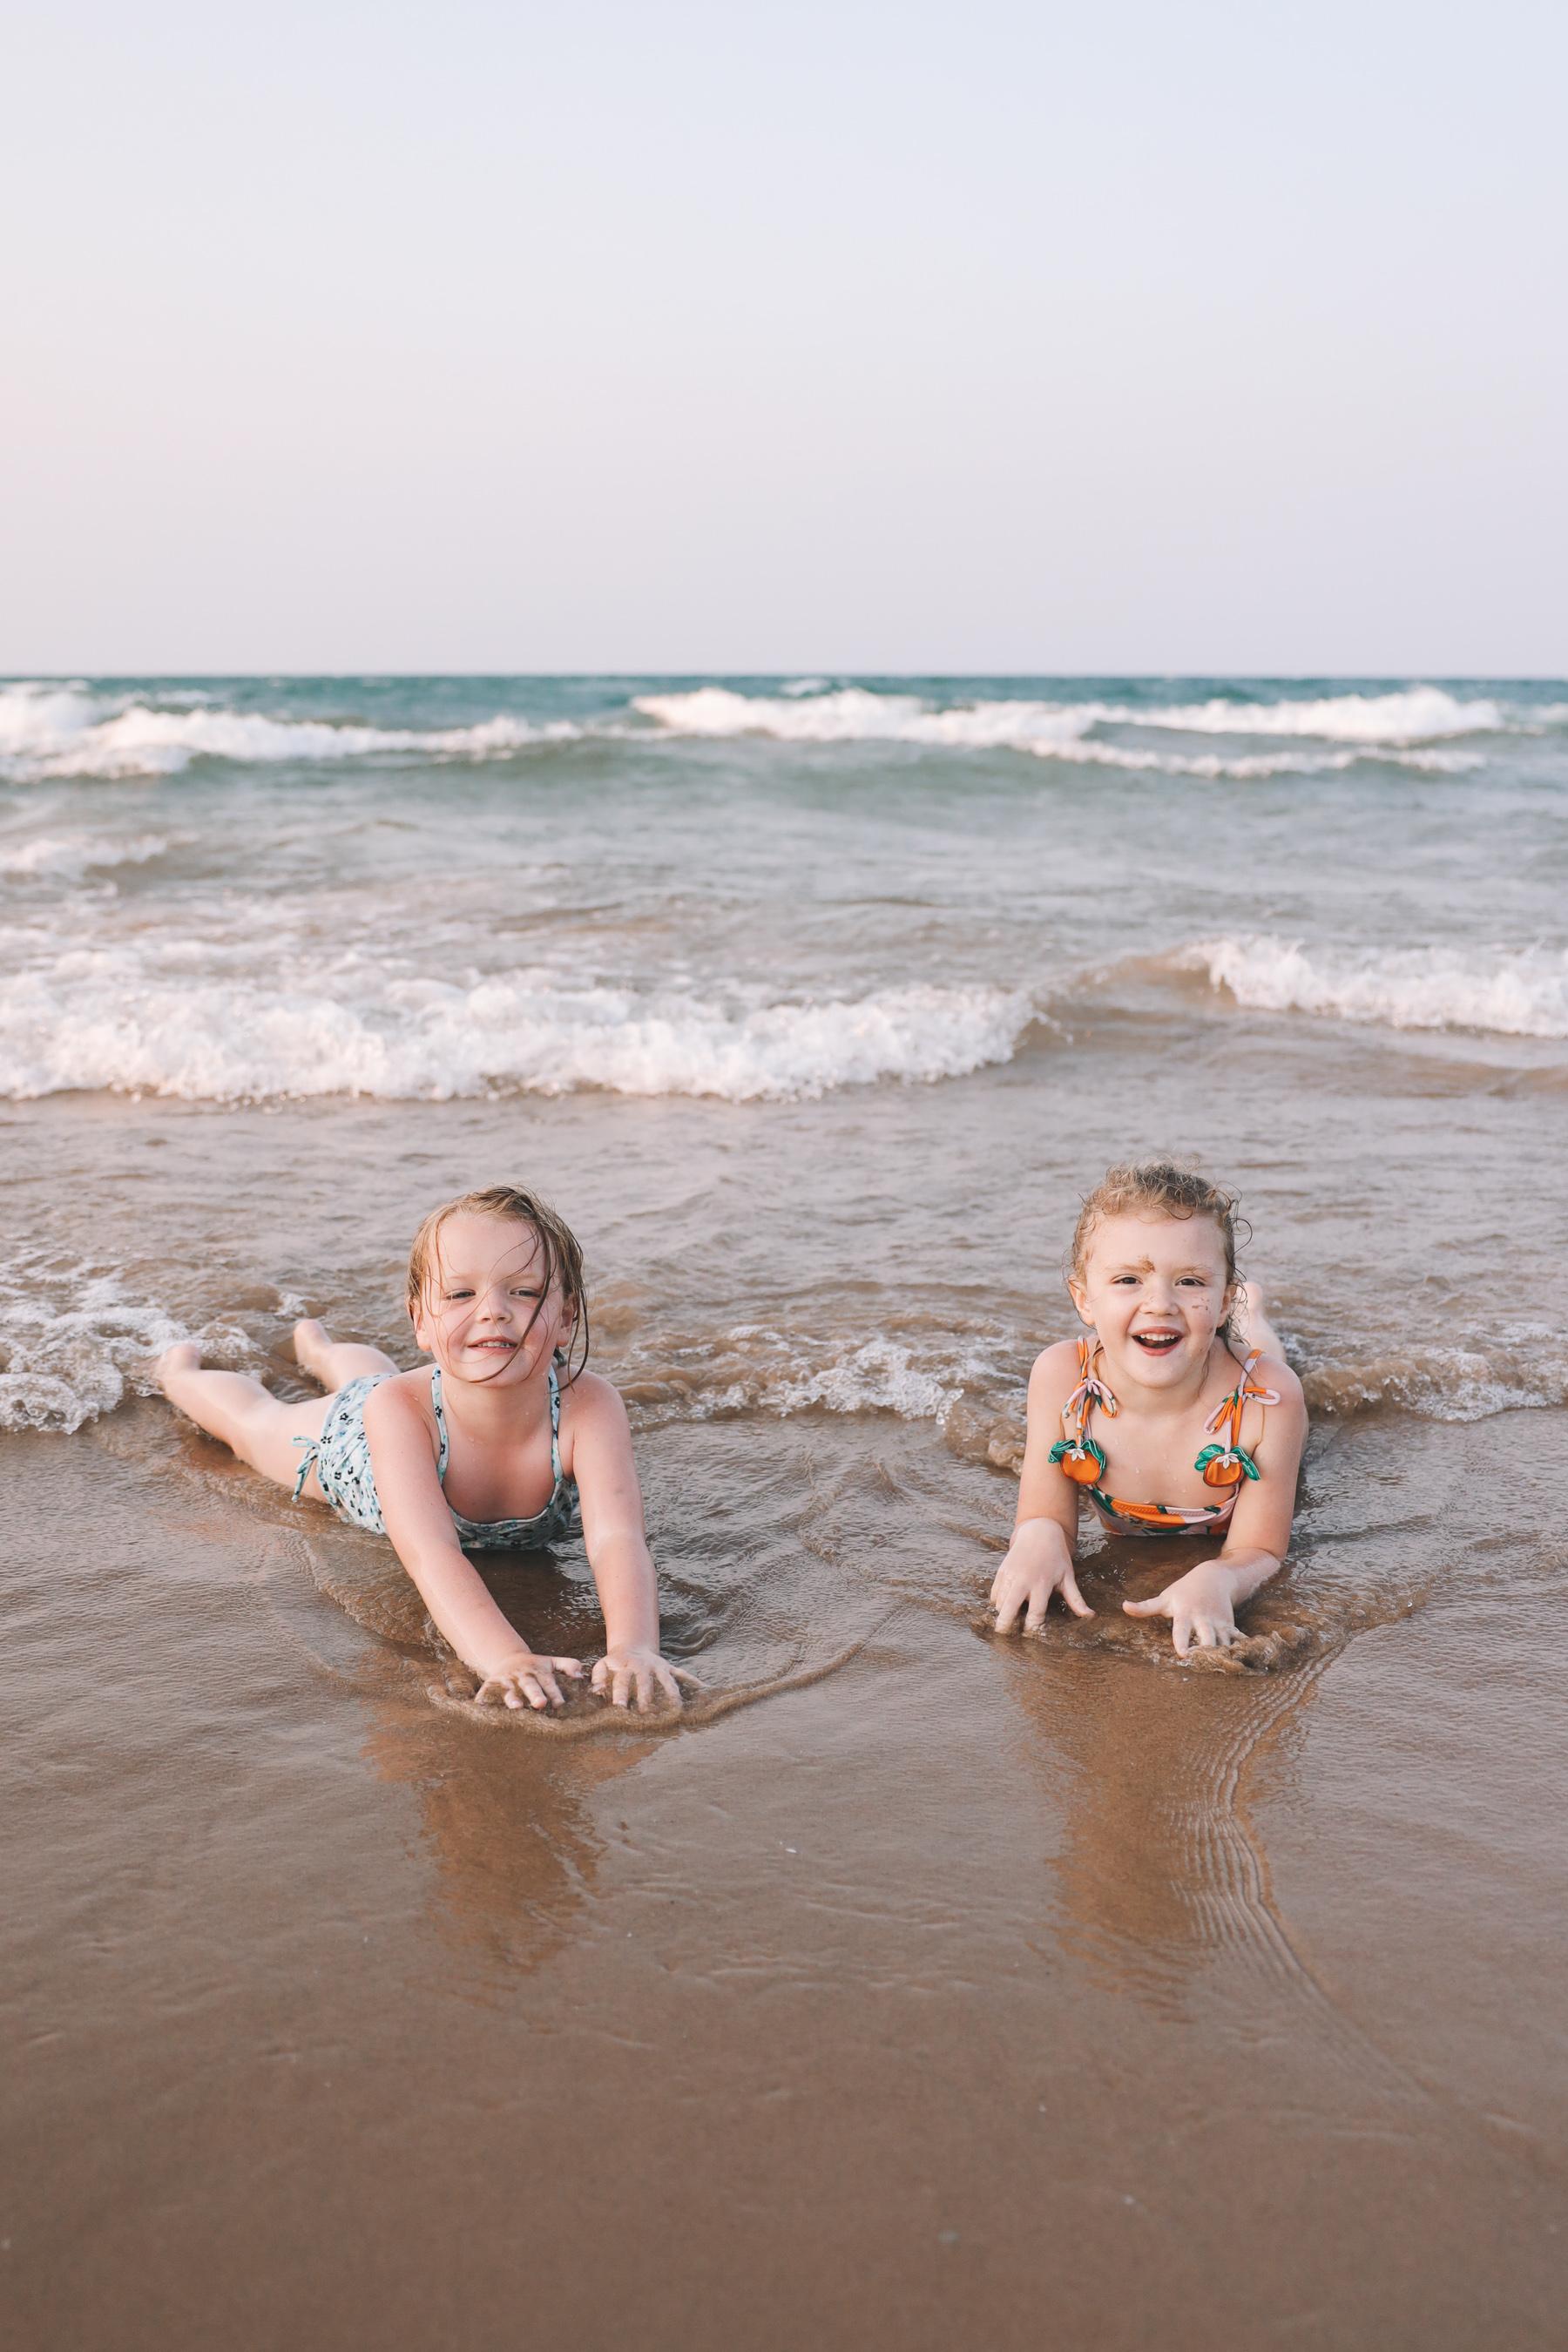 Foster Beach, Chicago with kids